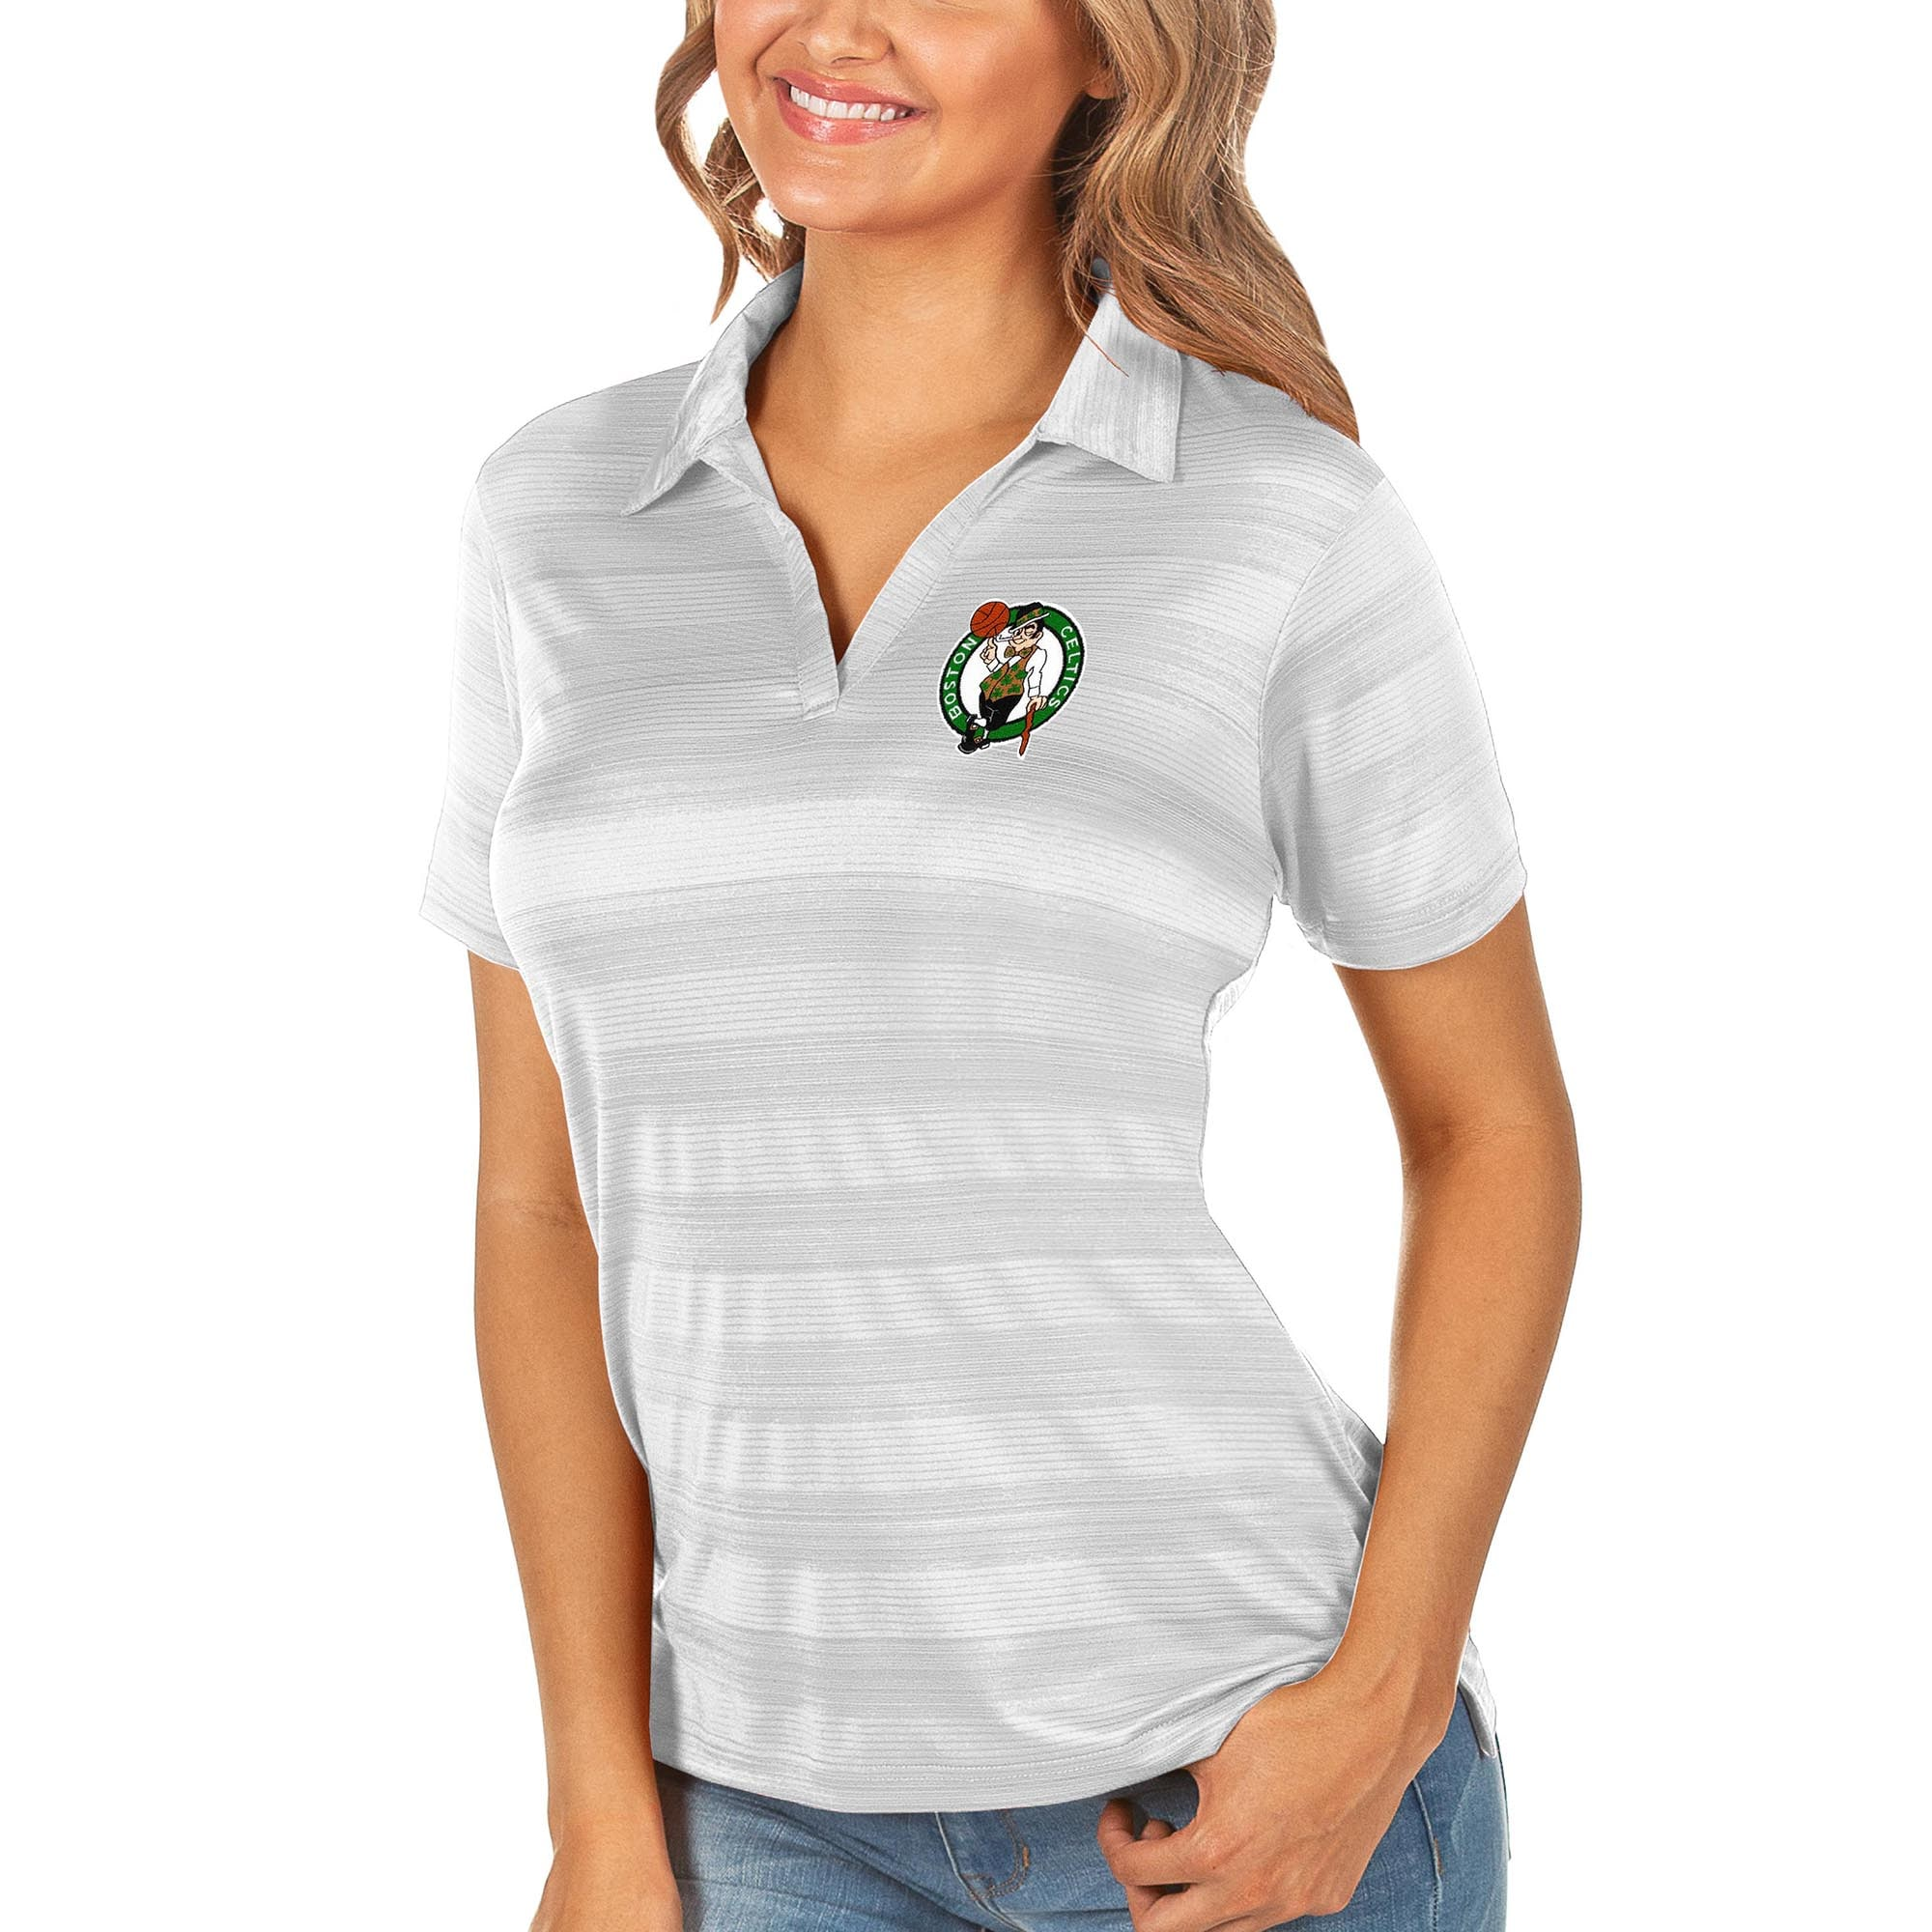 Boston Celtics Antigua Women's Compass Polo - White